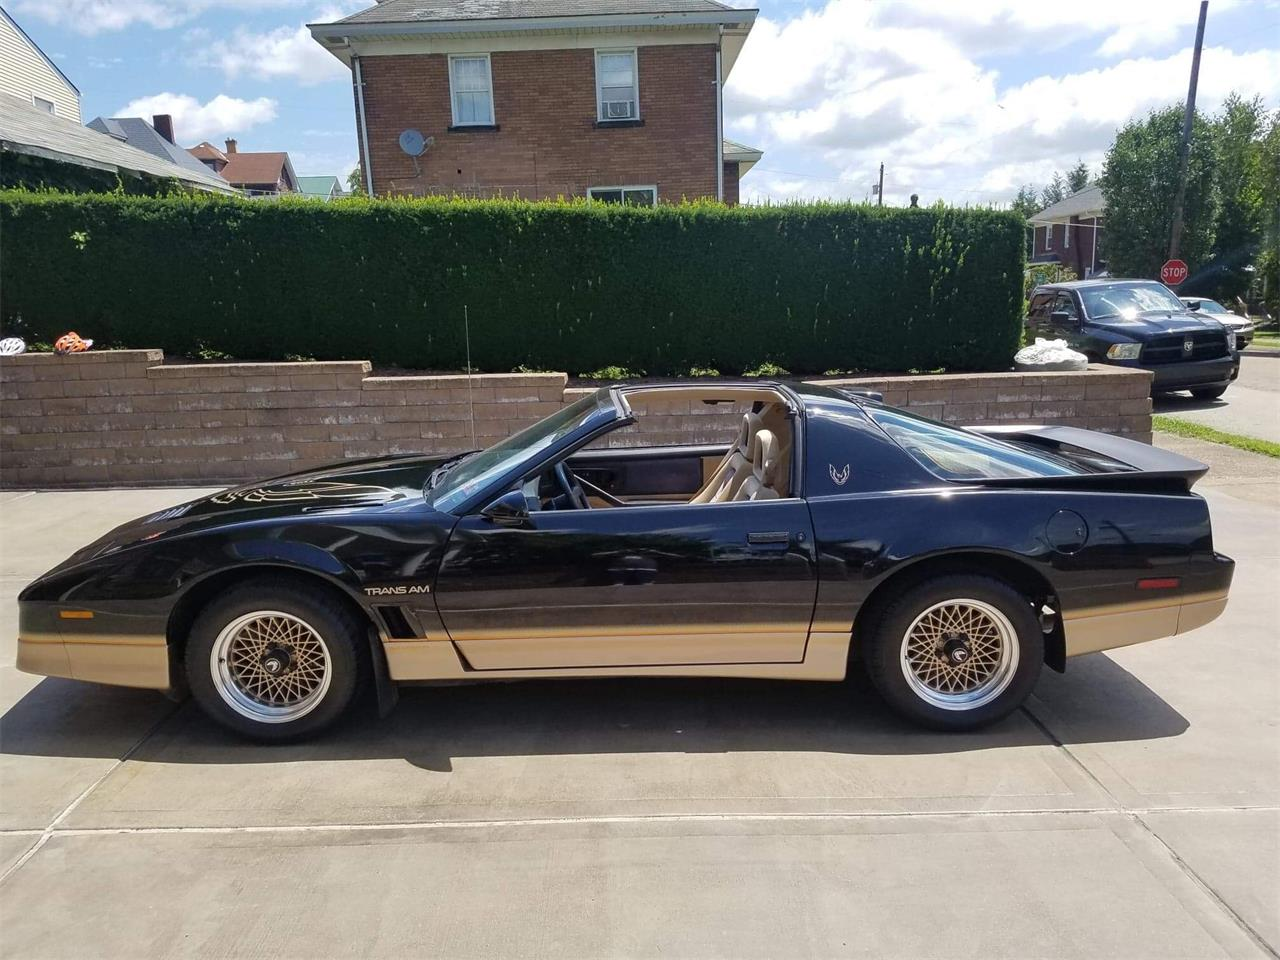 1986 pontiac firebird trans am for sale in springdale pa classiccarsbay com classiccarsbay